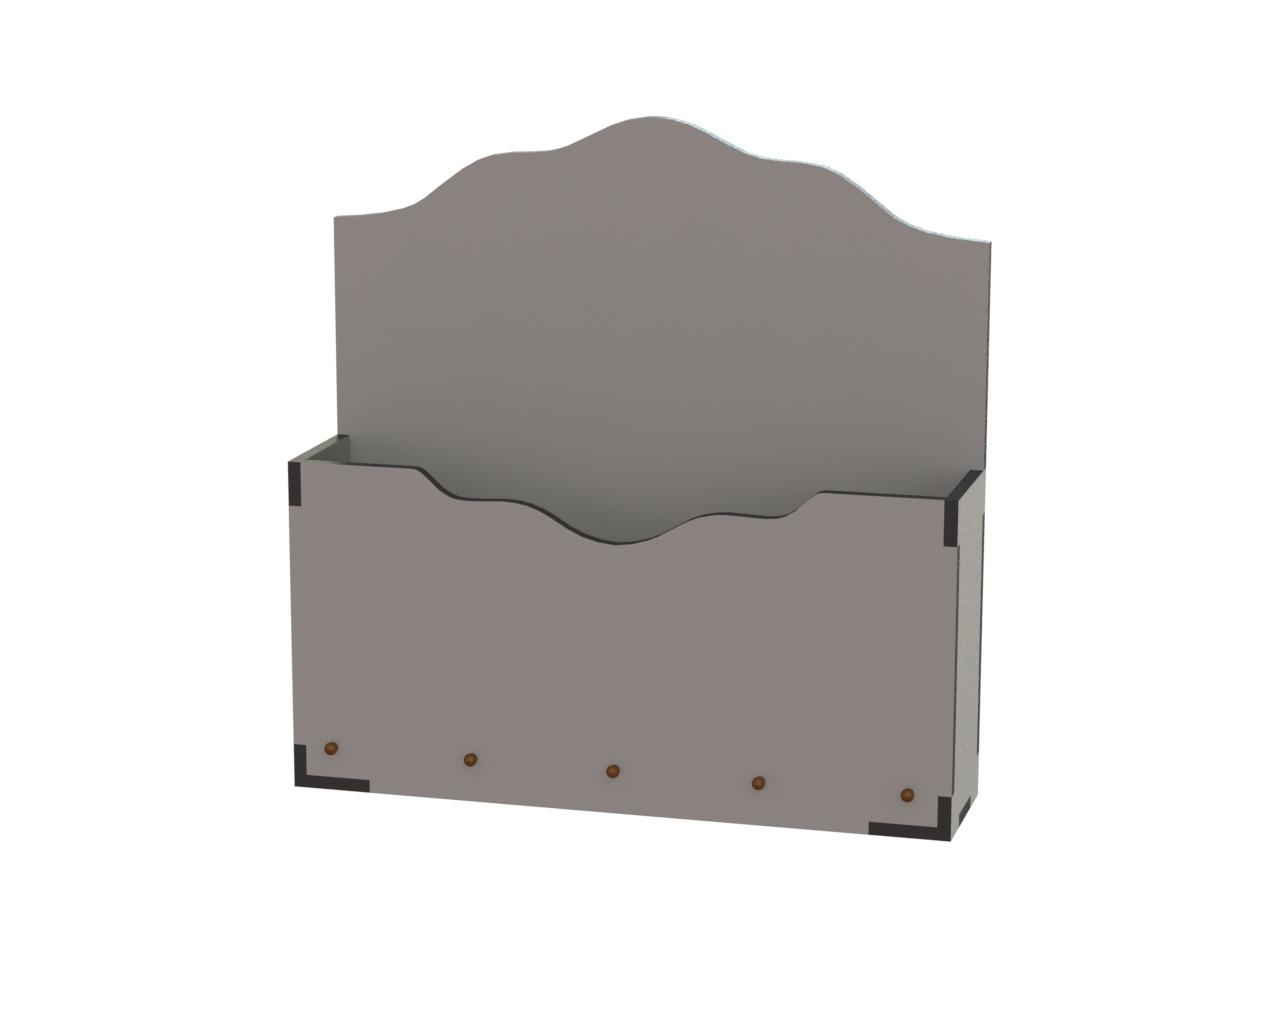 Laser Cut Decorative Box Wood Free DXF File